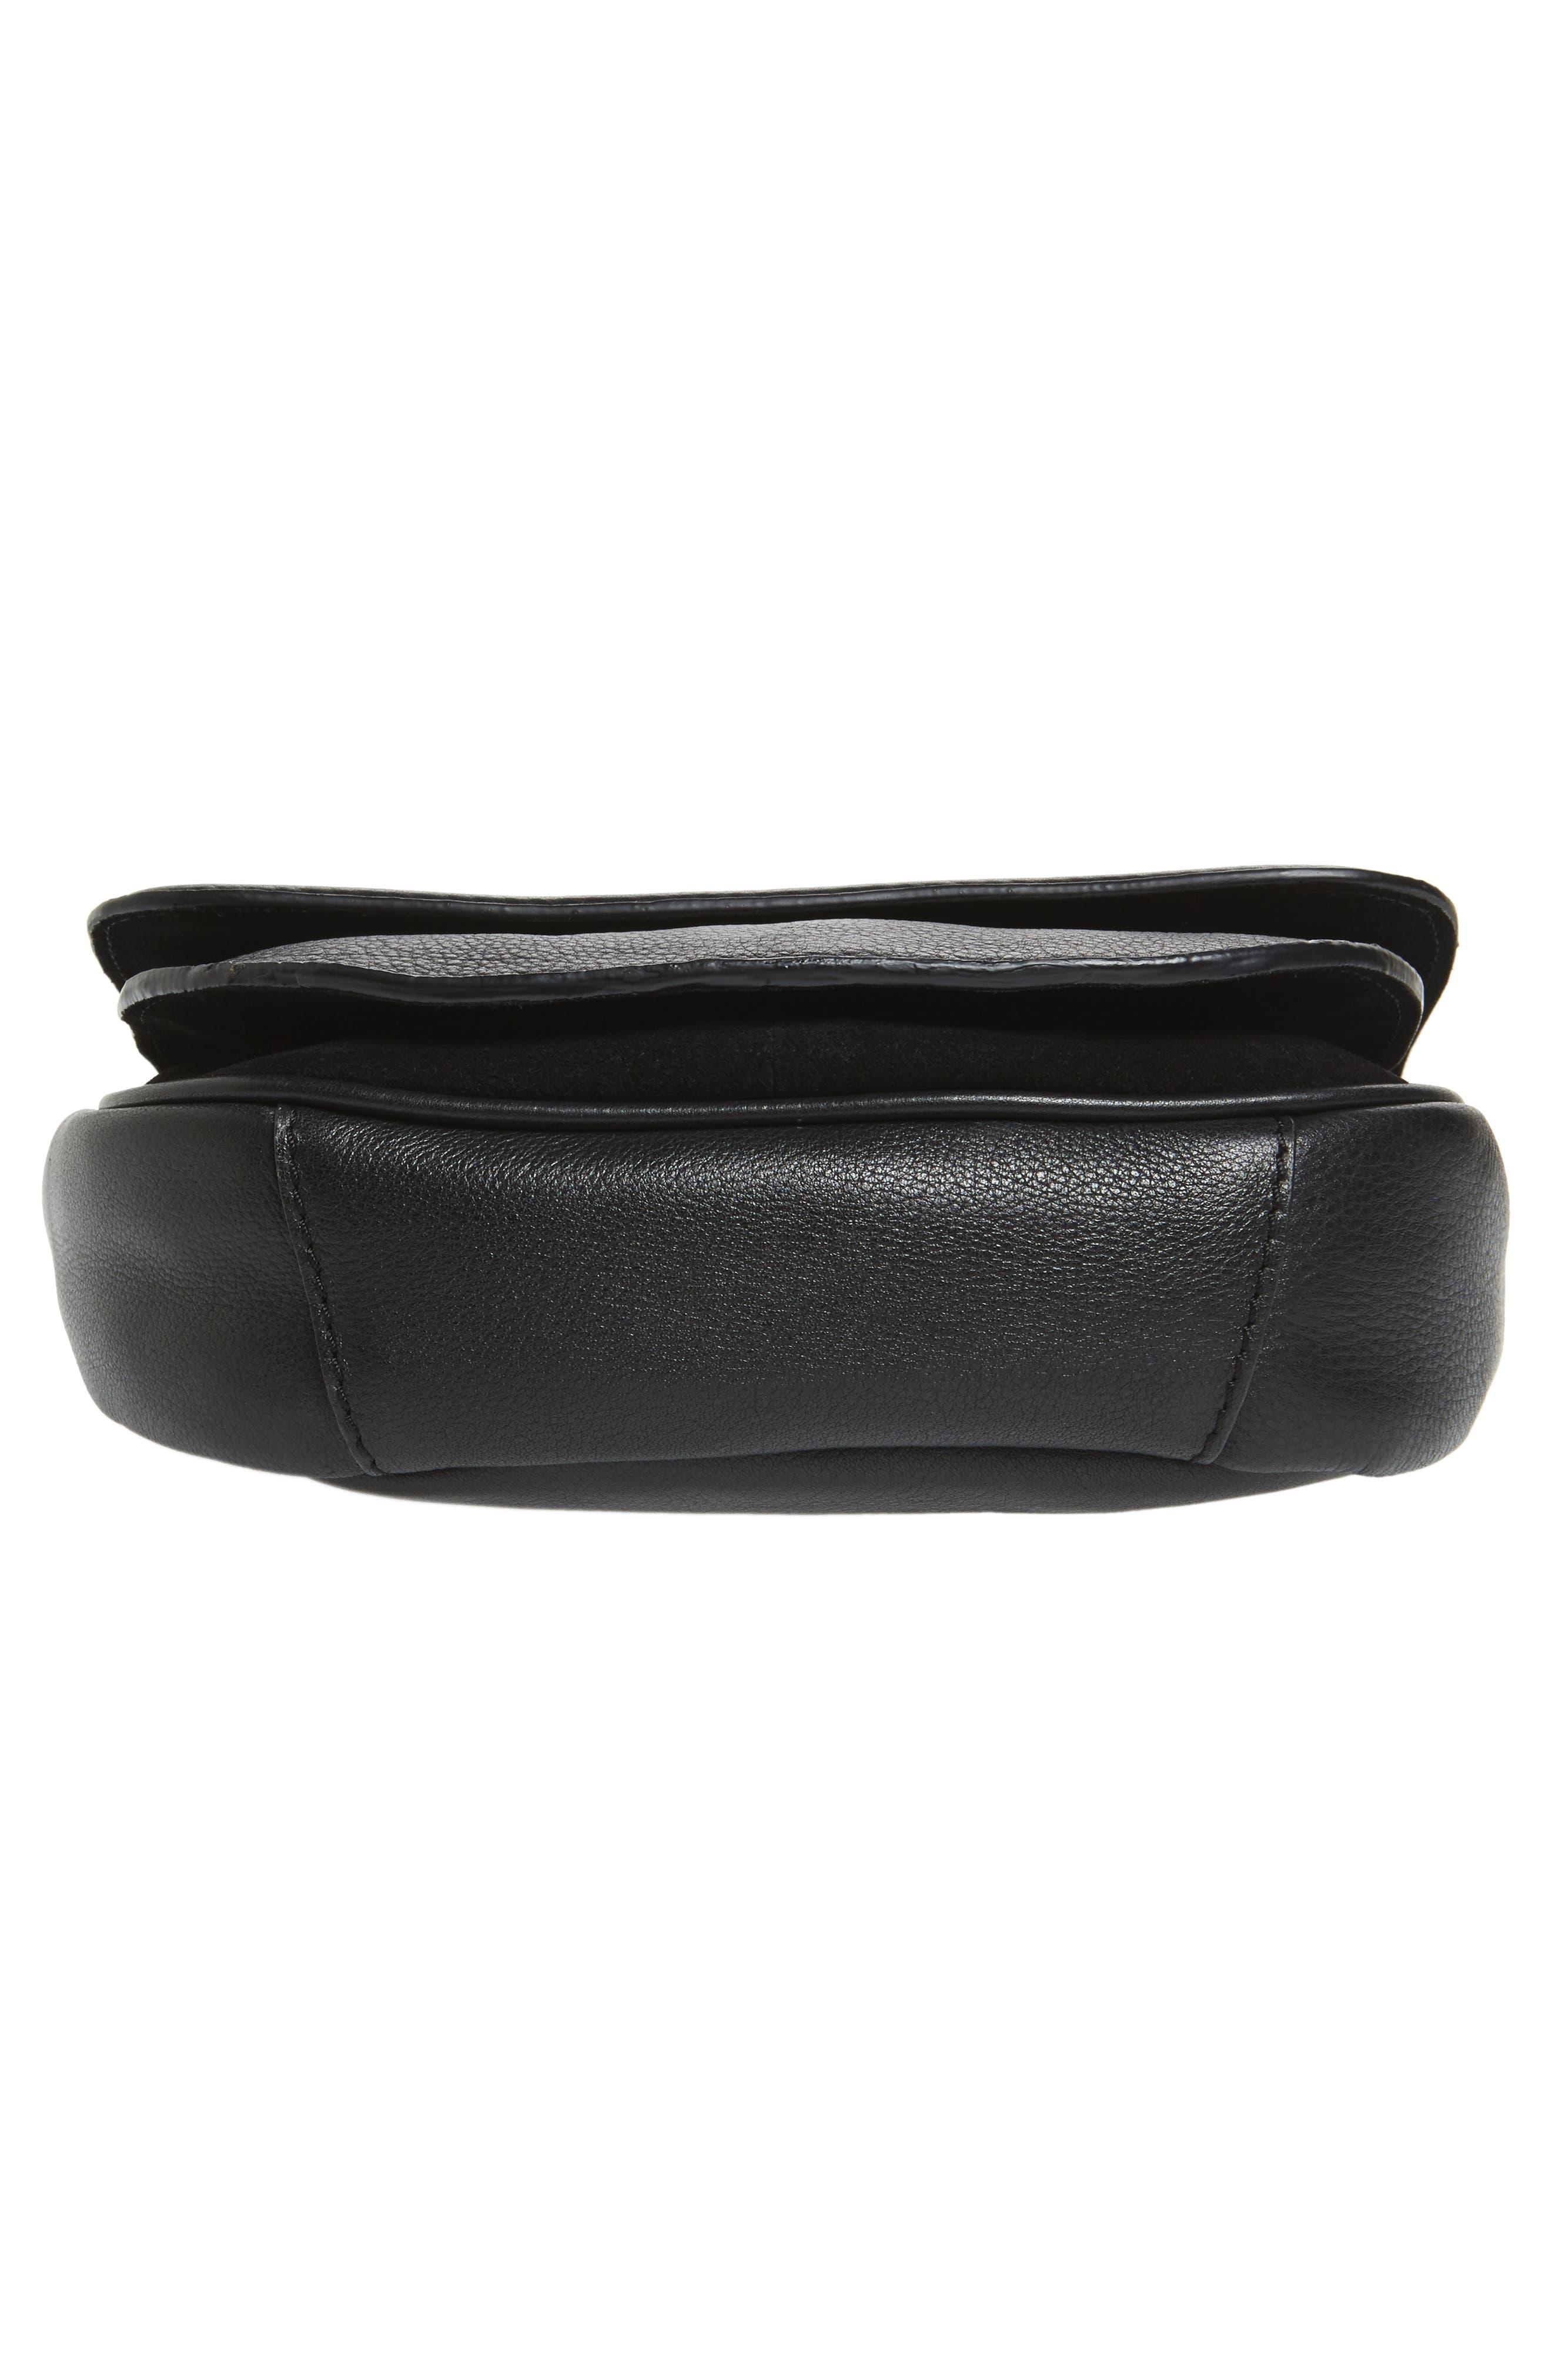 Jasmine Leather Saddle Bag,                             Alternate thumbnail 6, color,                             001